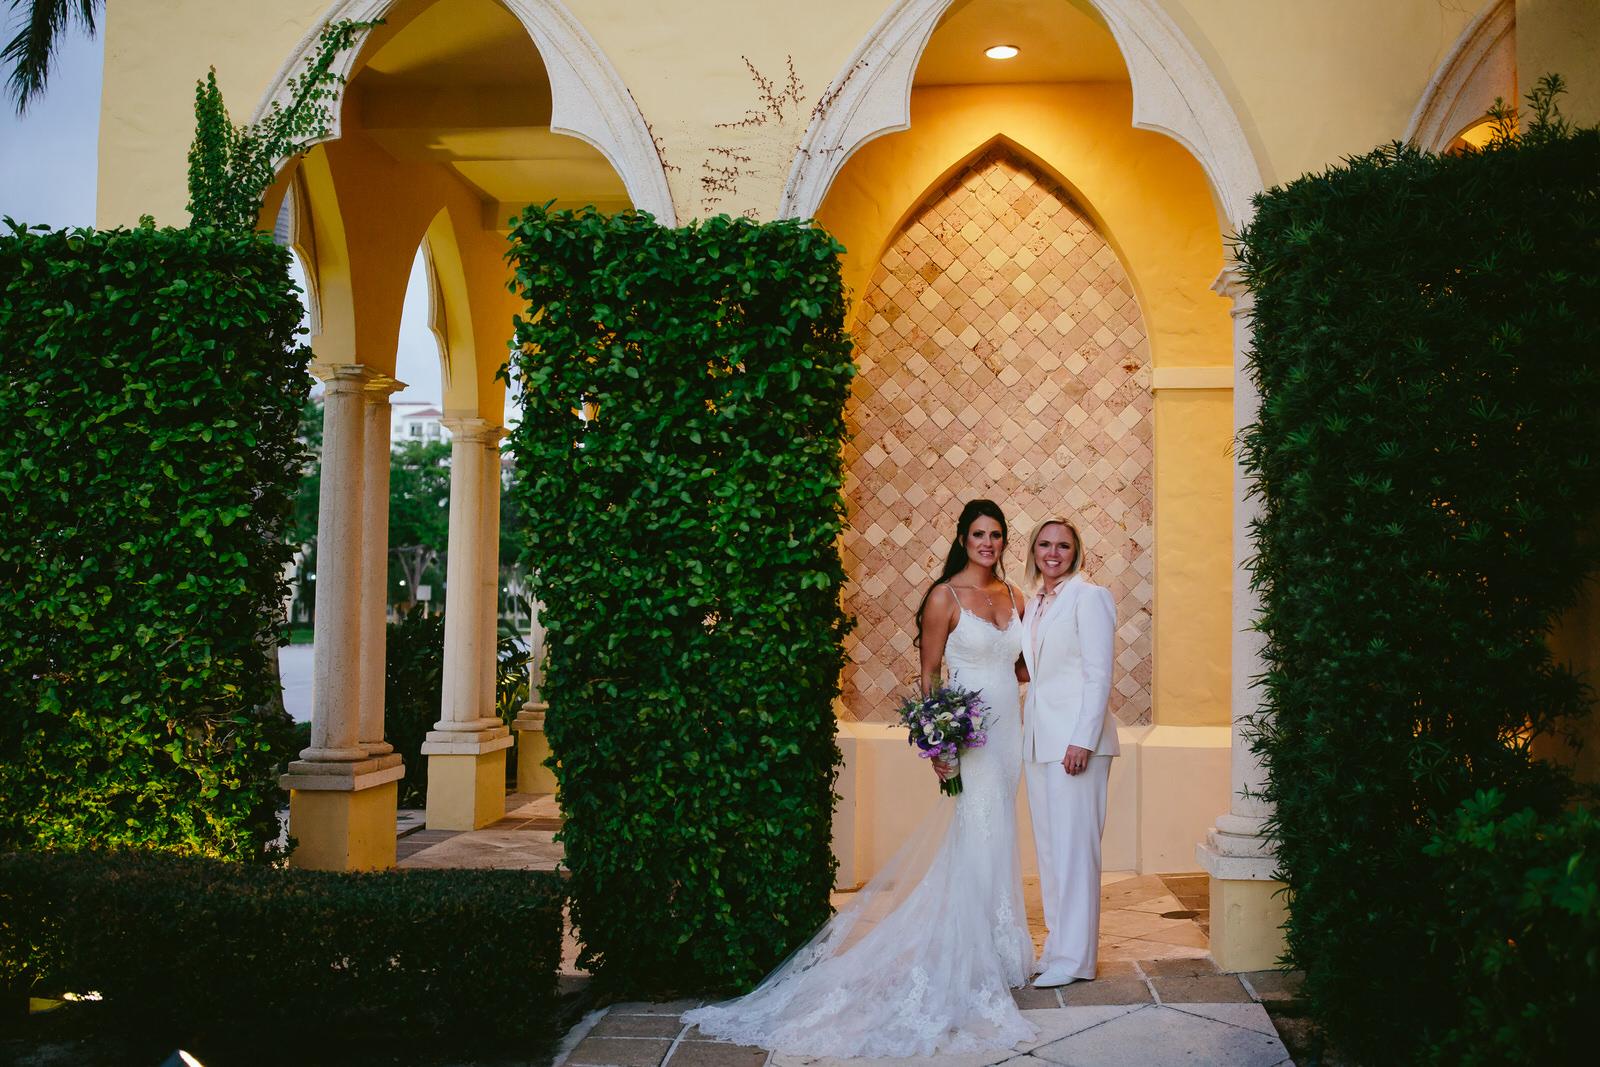 lgbtq_wedding_photographer_international_destination_tiny_house_photo_two_brides.jpg